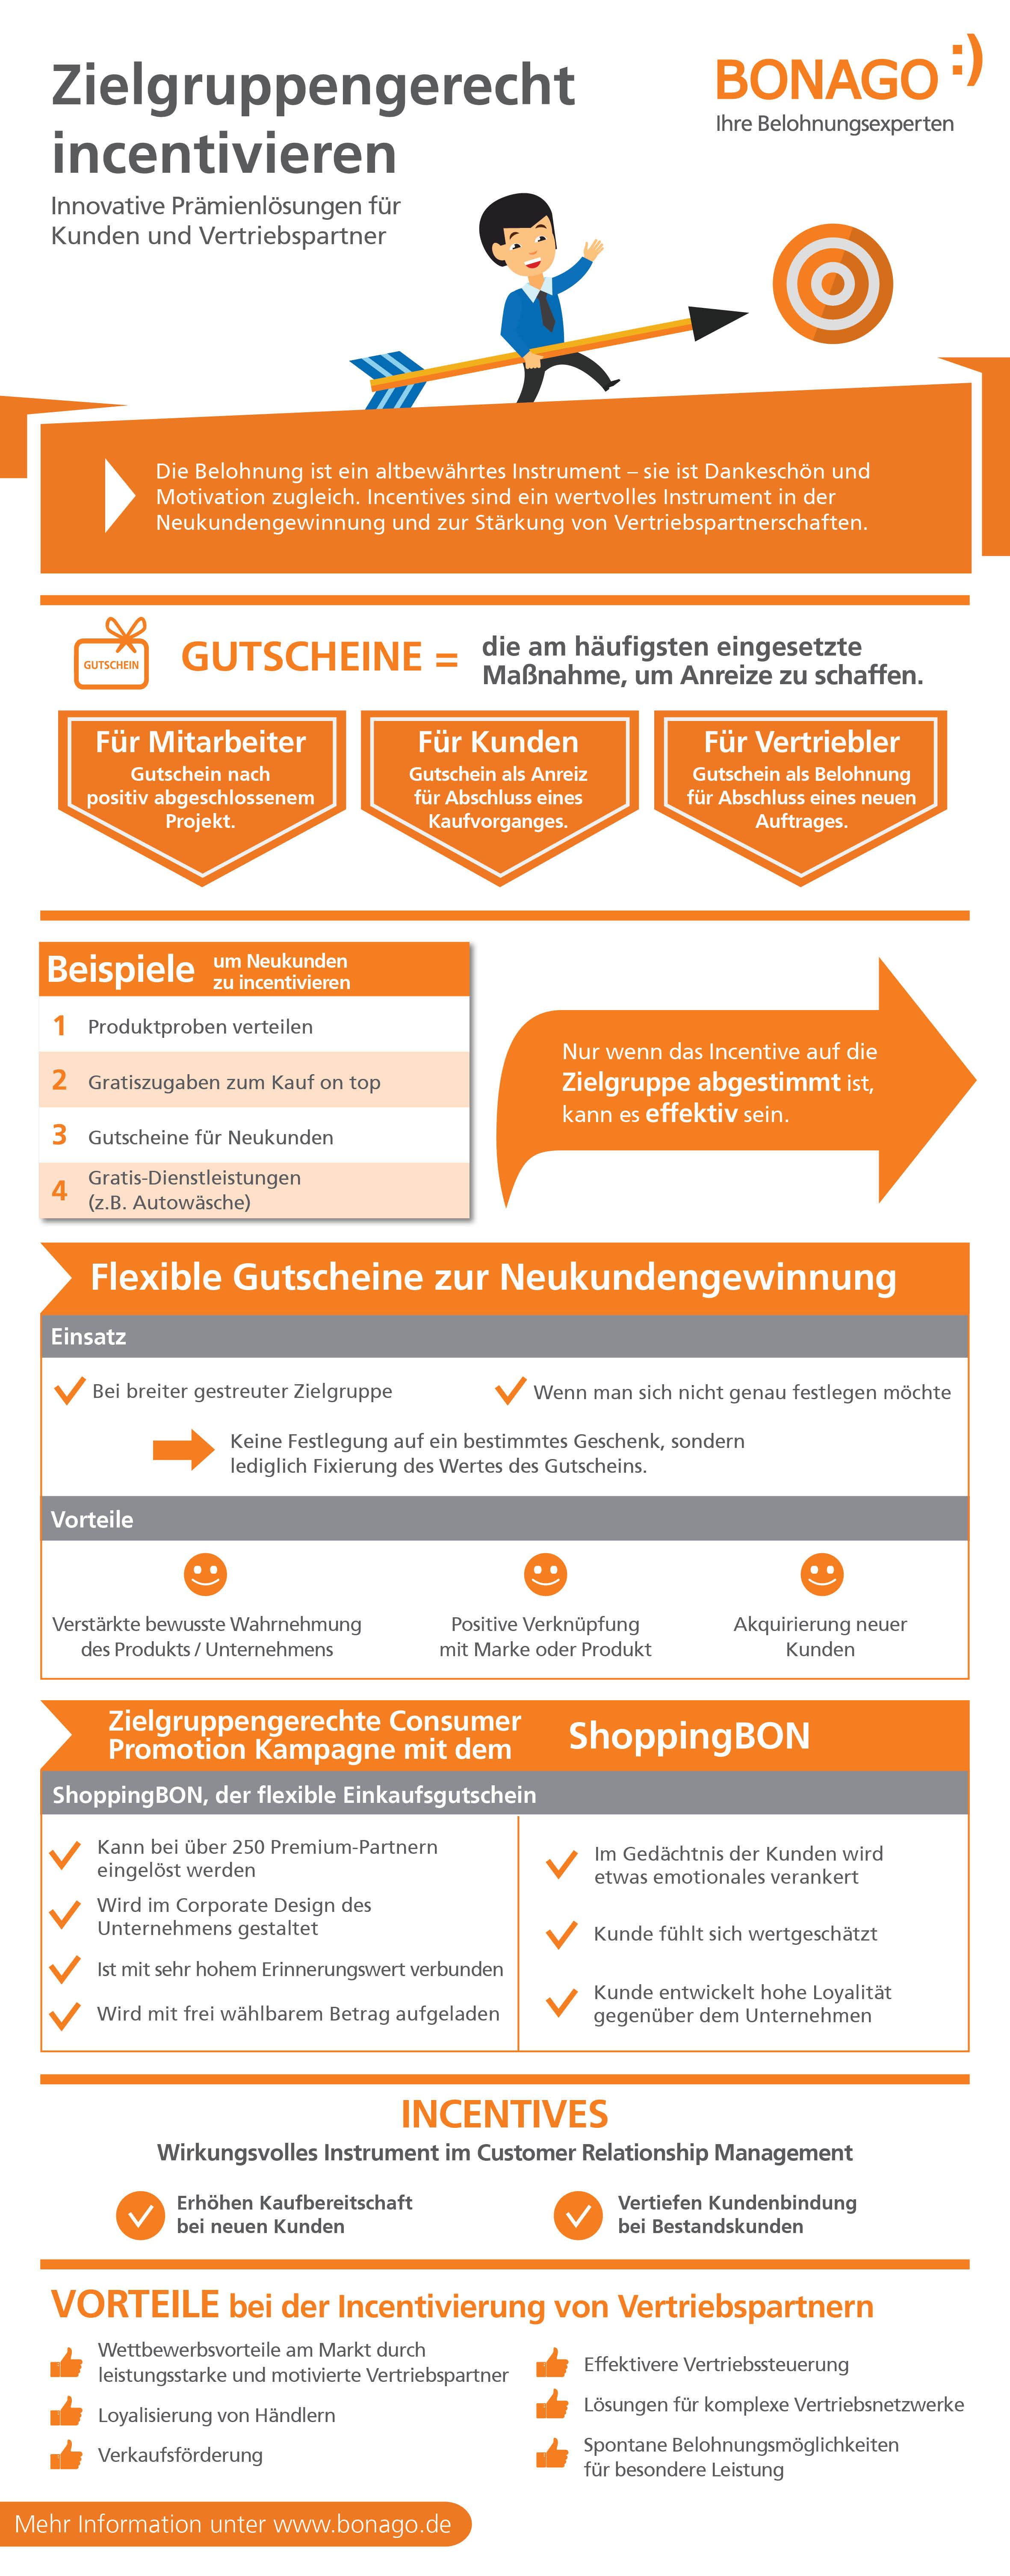 Infografik Zielgruppengerecht incentivieren